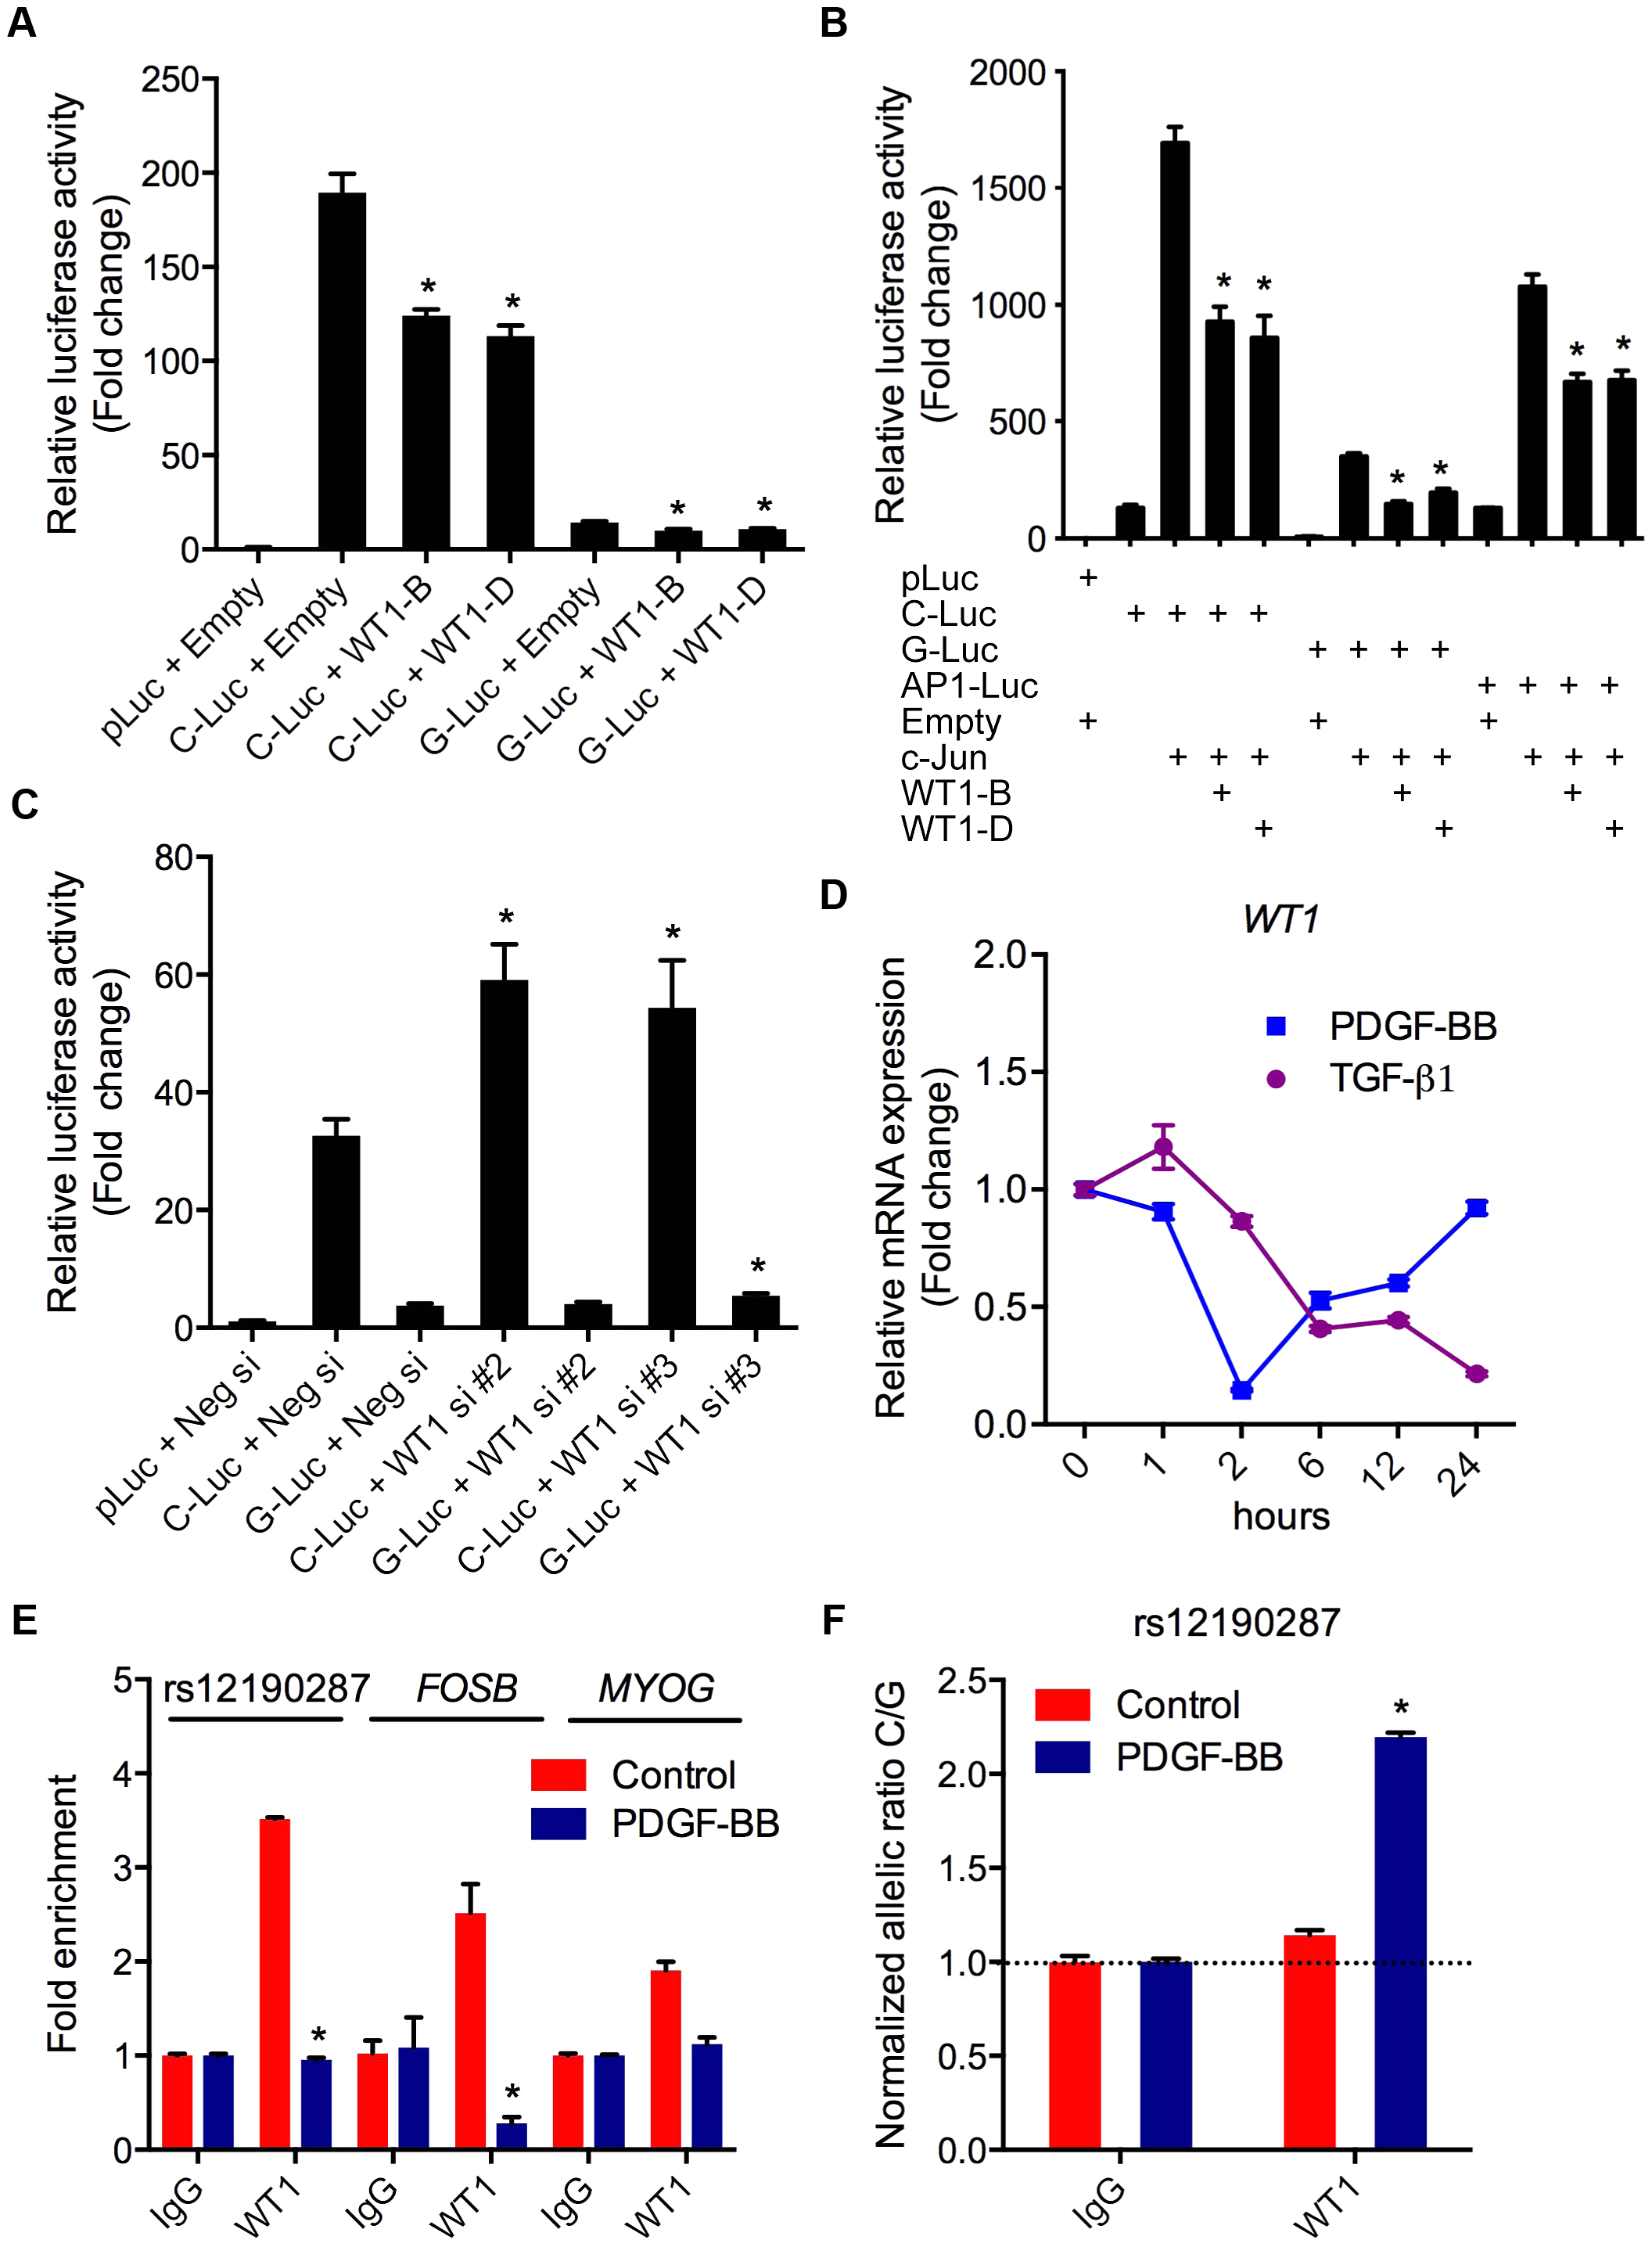 WT1 regulation of rs12190287 <i>in vitro</i> and <i>in vivo</i>.